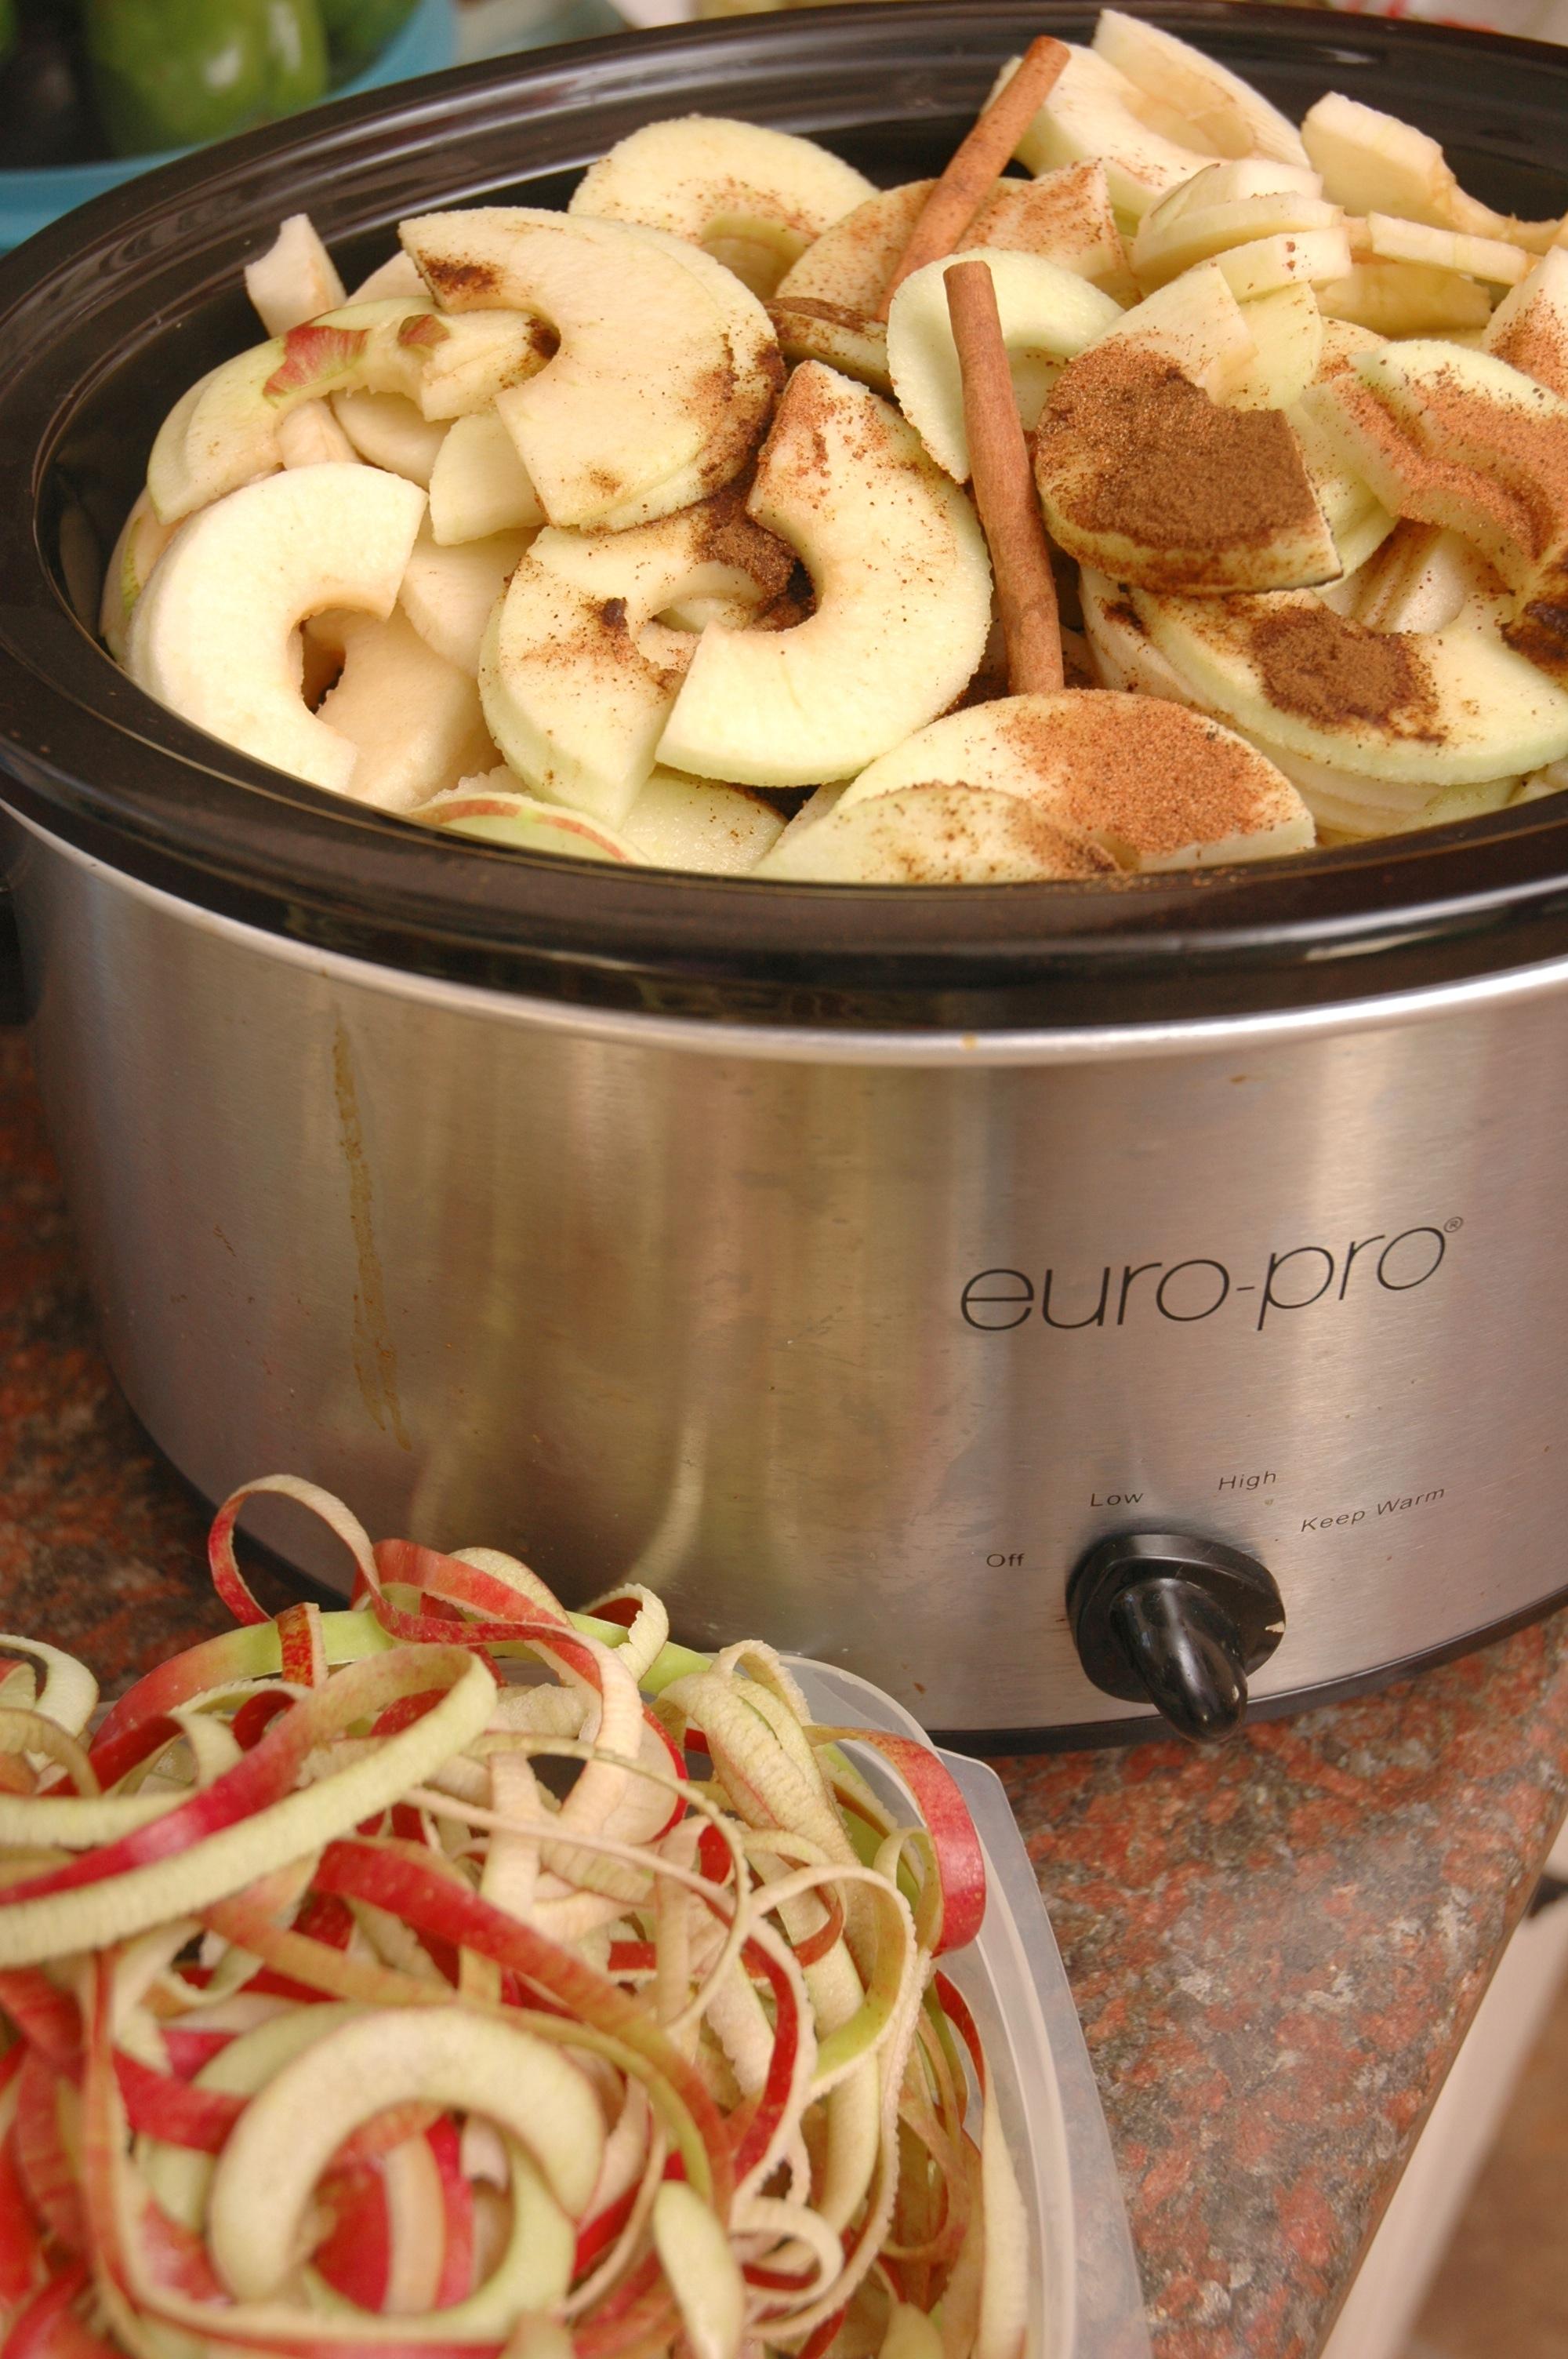 Apple butter in the crockpot